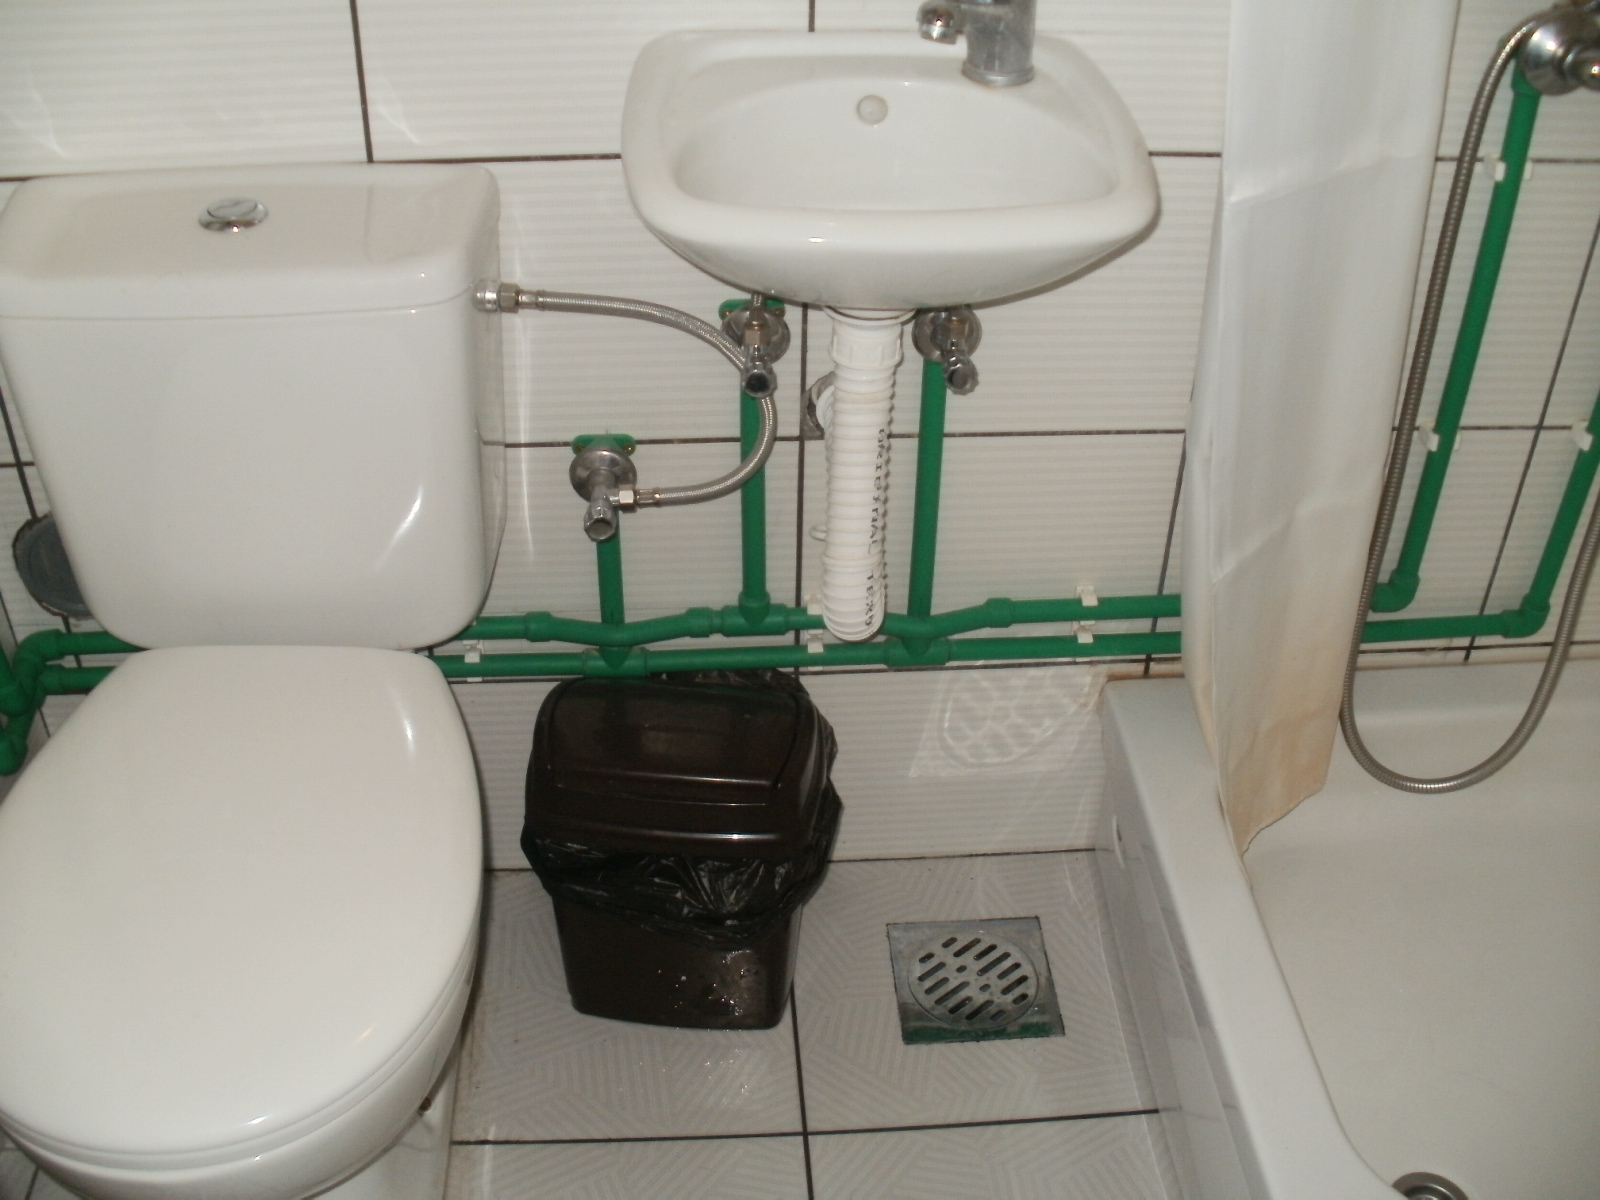 24_Toalet_u_sobama_1_do_8.JPG - 468,76 kB